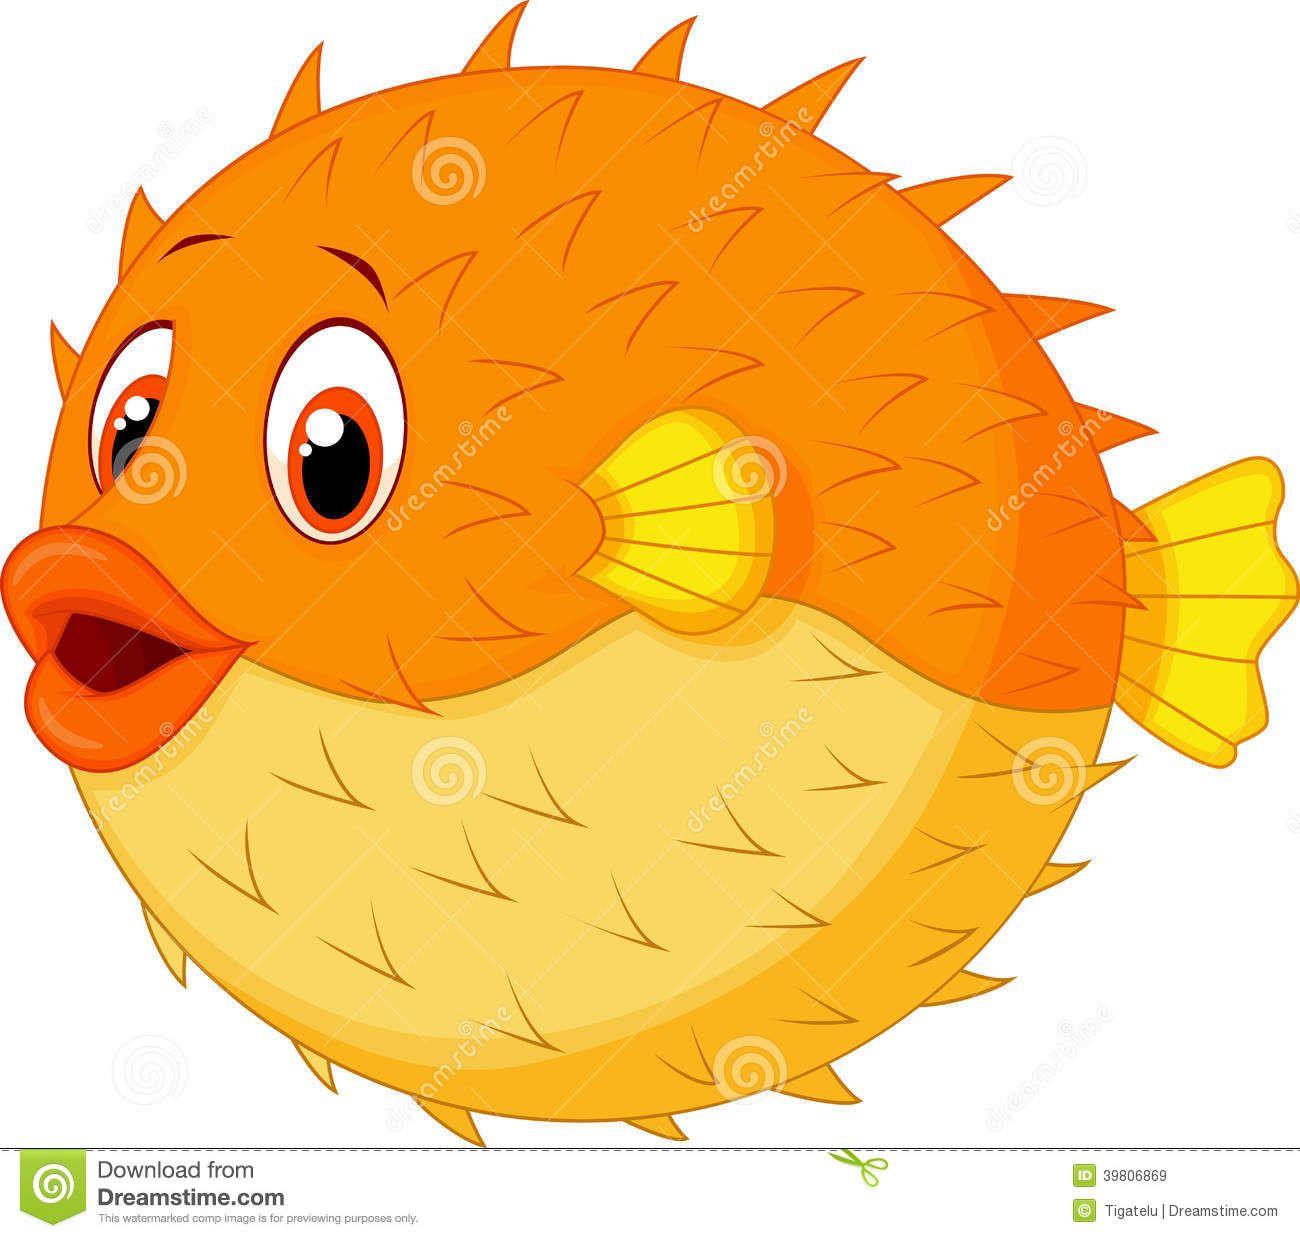 Illustration About Illustration Of Cute Puffer Fish Cartoon Illustration Of Cute Avatar Comic 3980686 Cartoon Fish Cartoon Sea Animals Puffer Fish Cartoon